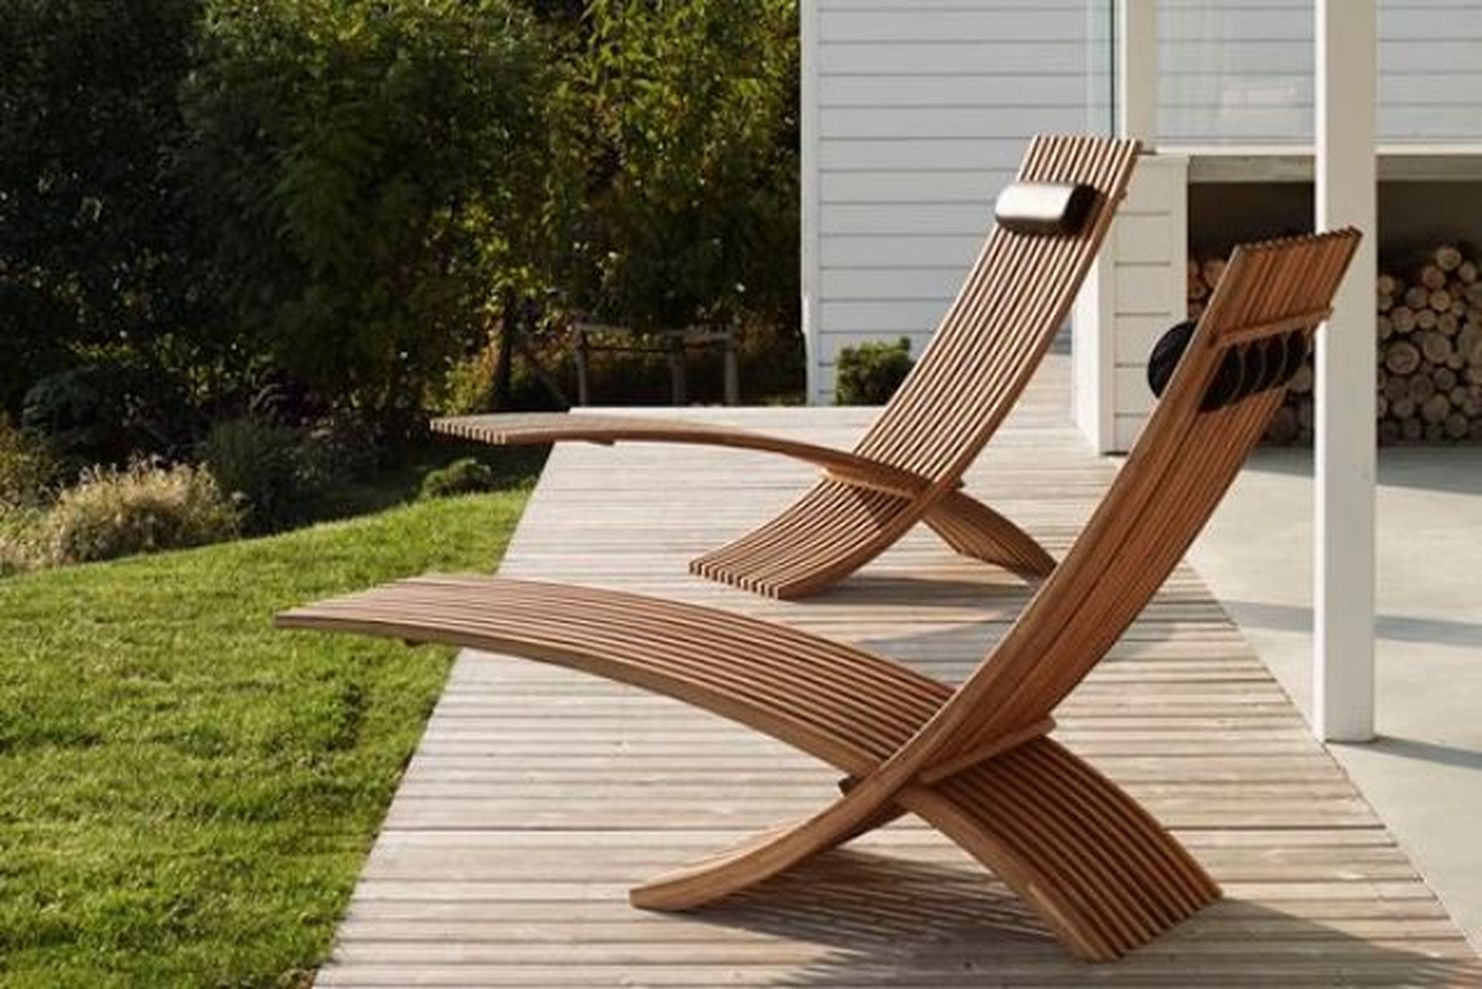 86 Stylish Small Patio Furniture Ideas